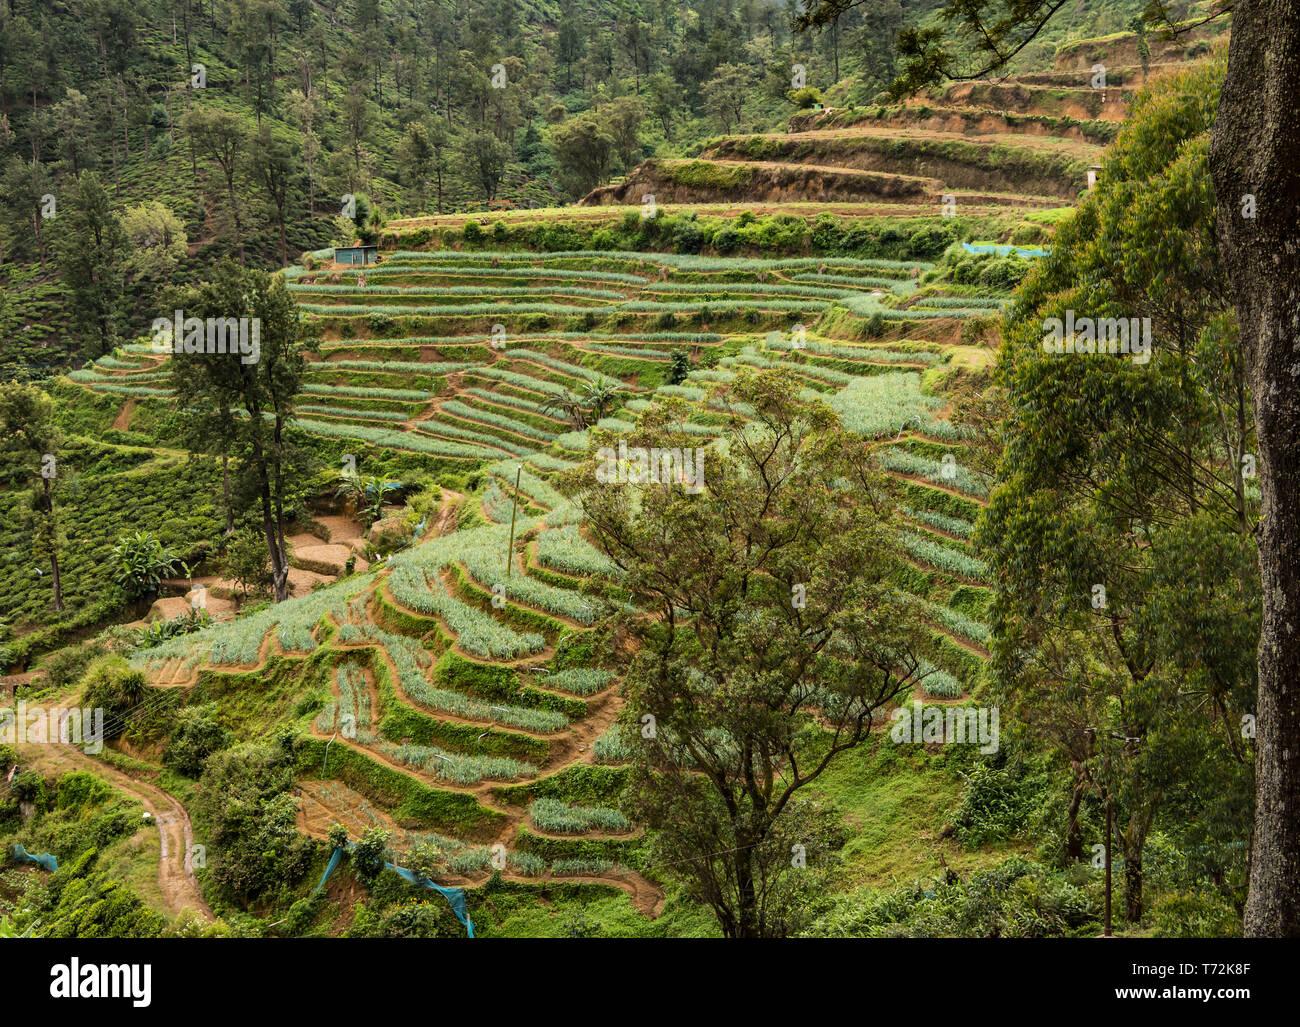 Sri Lanka La Agricultura En Terrazas Foto Imagen De